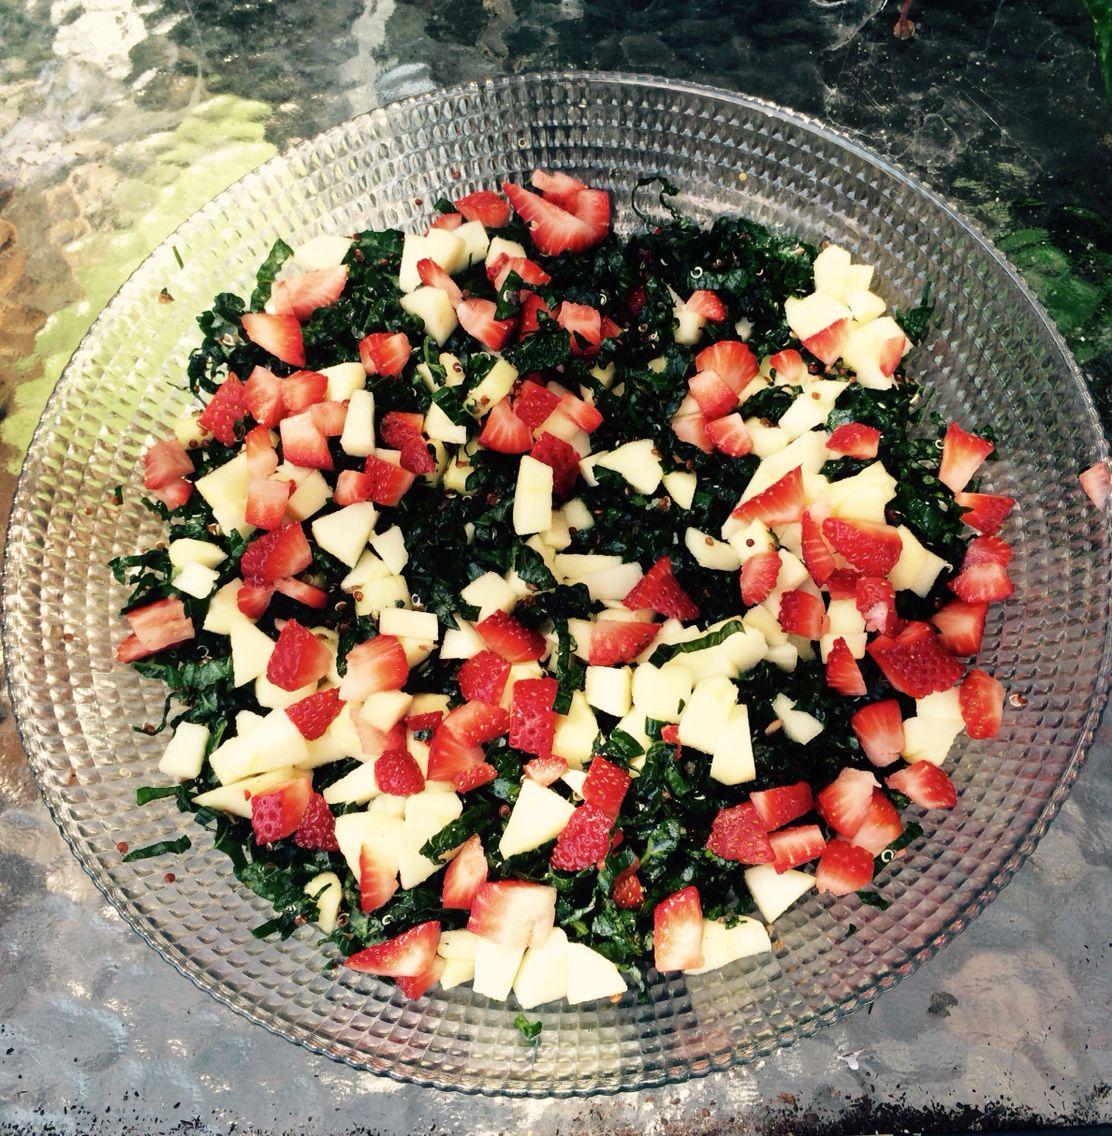 Kale Summer Salad  Apples, strawberries, lemon juice, sea salt  Simple & Delicious.